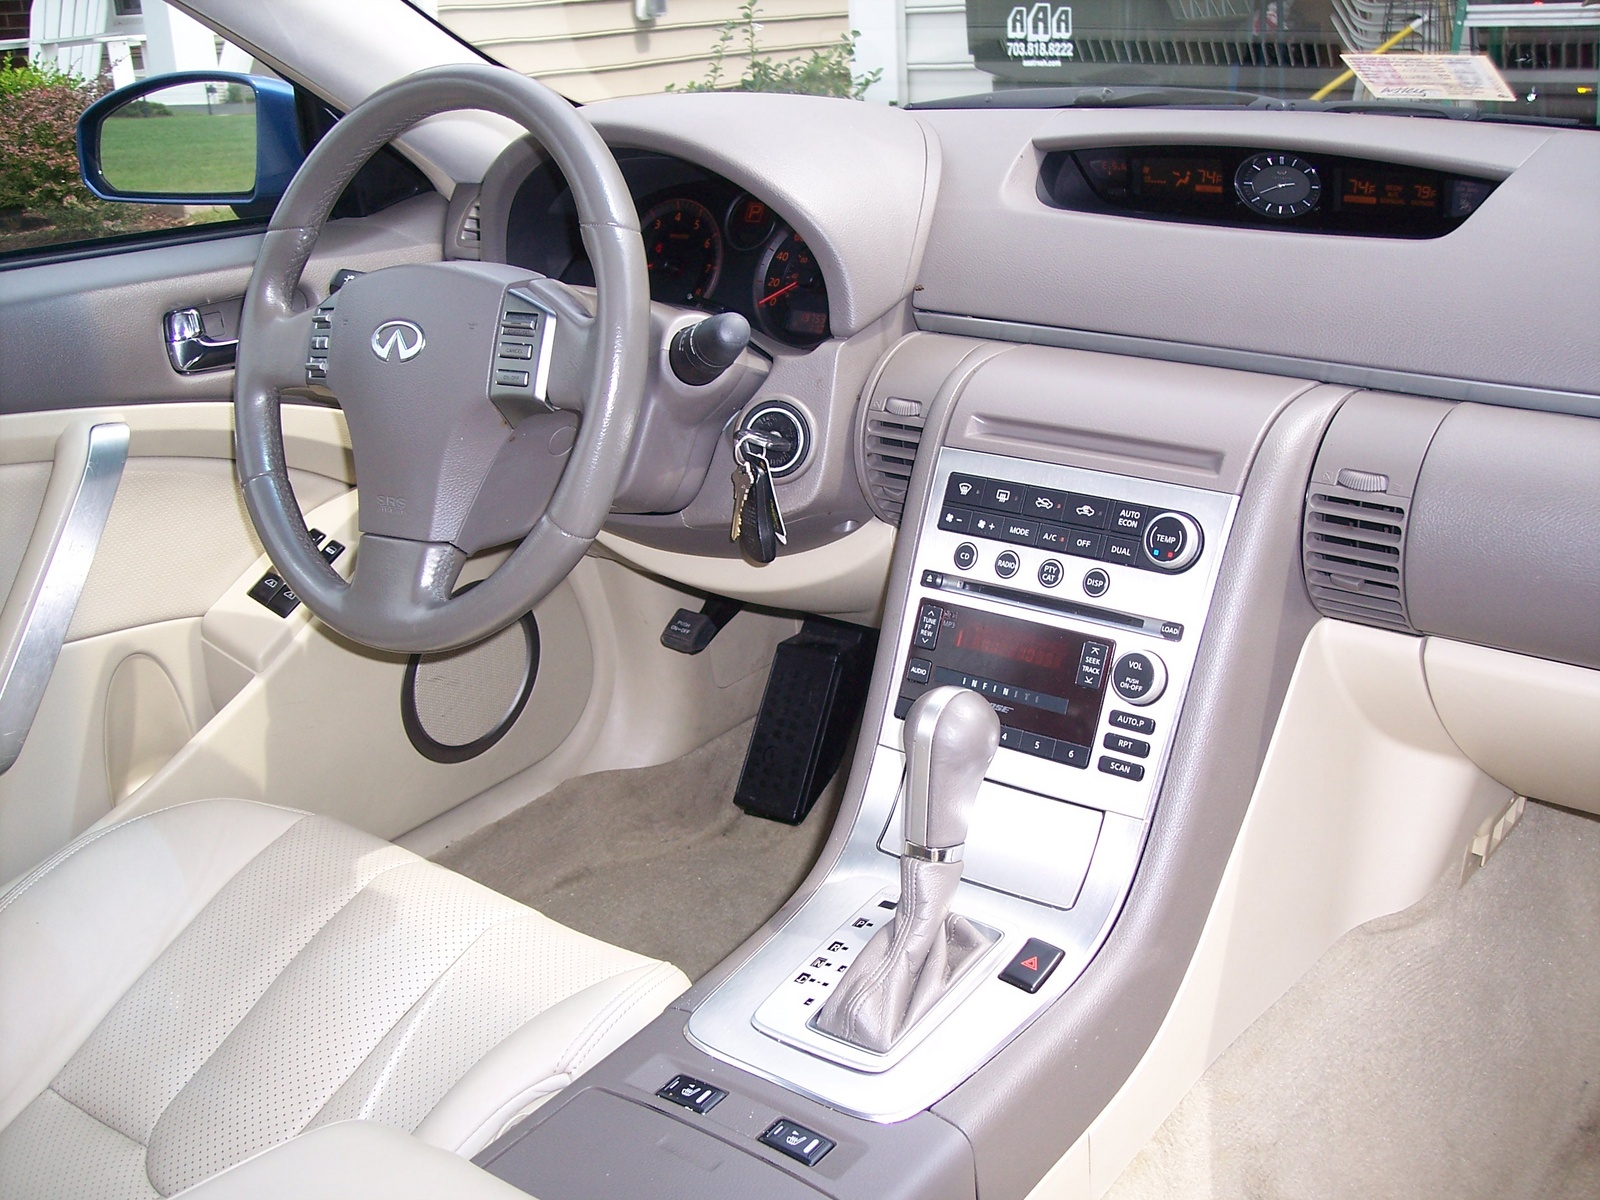 100 reviews 2005 g35 coupe interior on margojoyo hottrendstoday84977 infiniti g35 4 door images vanachro Choice Image